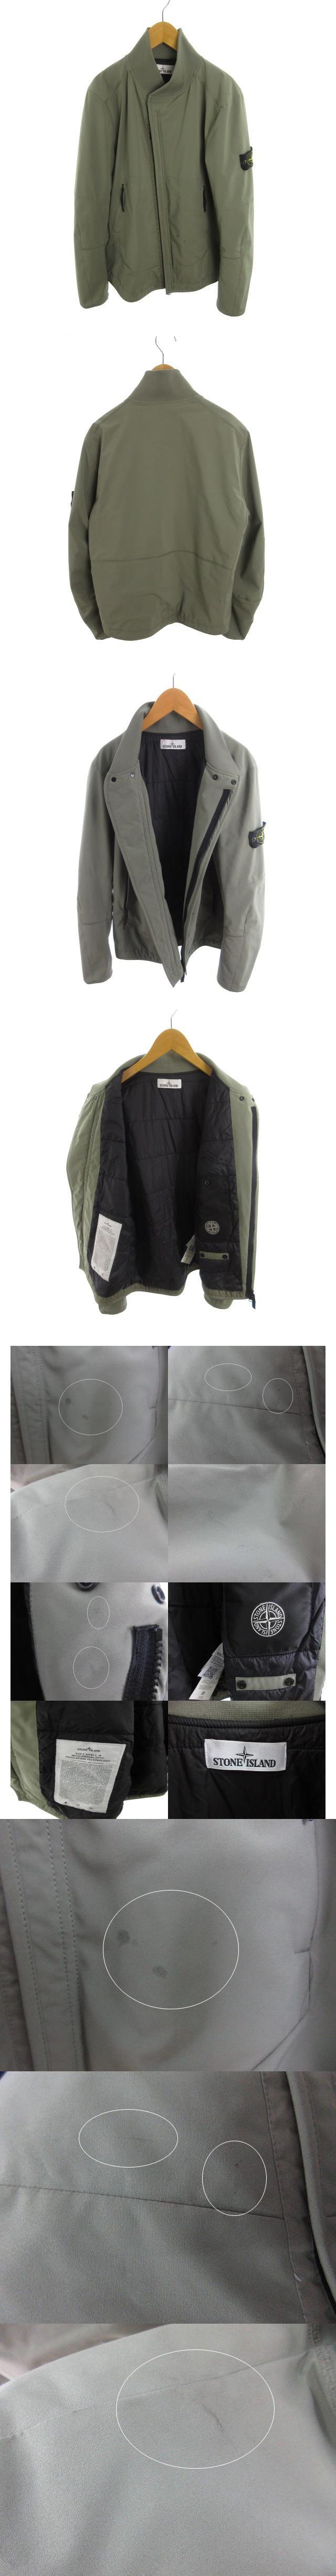 MA-1 ジャケット ブルゾン 中綿 ジップアップ カーキ M アウター 国内正規品 豊田貿易